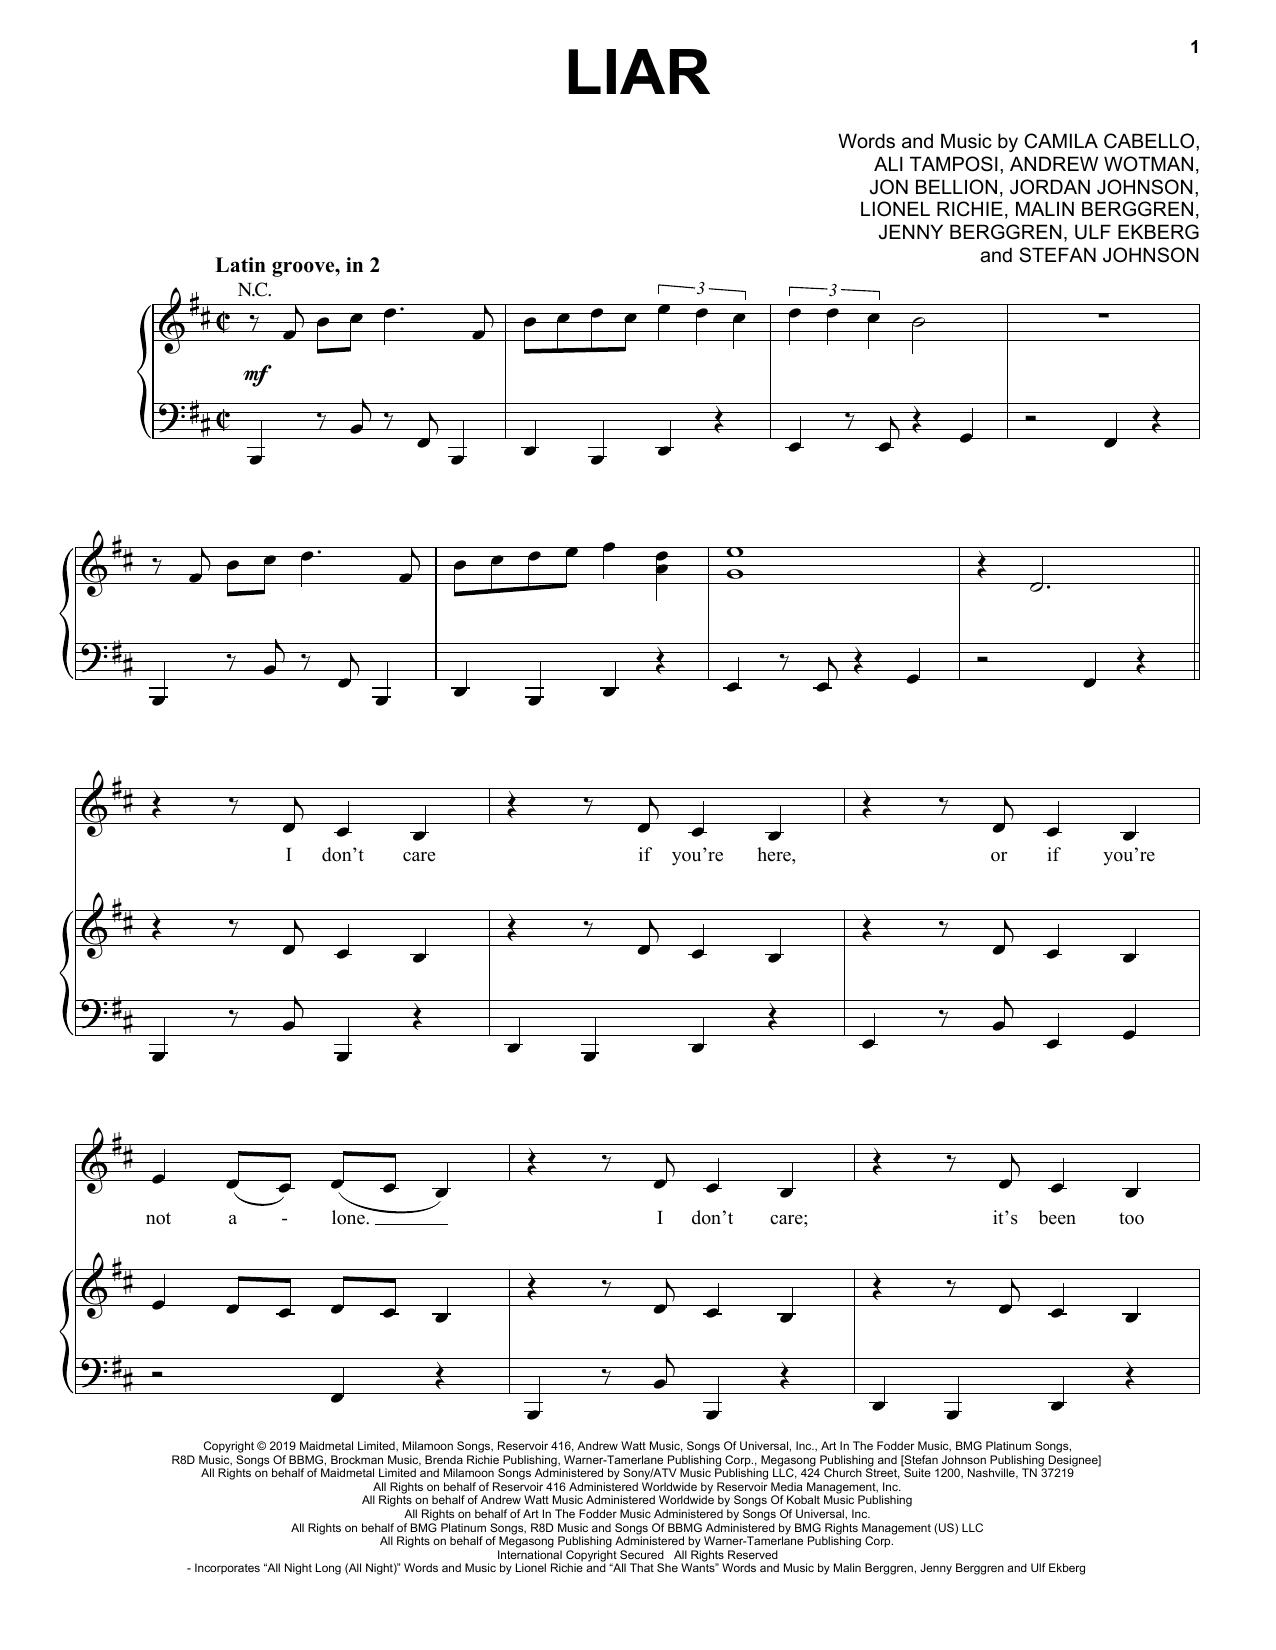 Camila Cabello Liar sheet music notes and chords